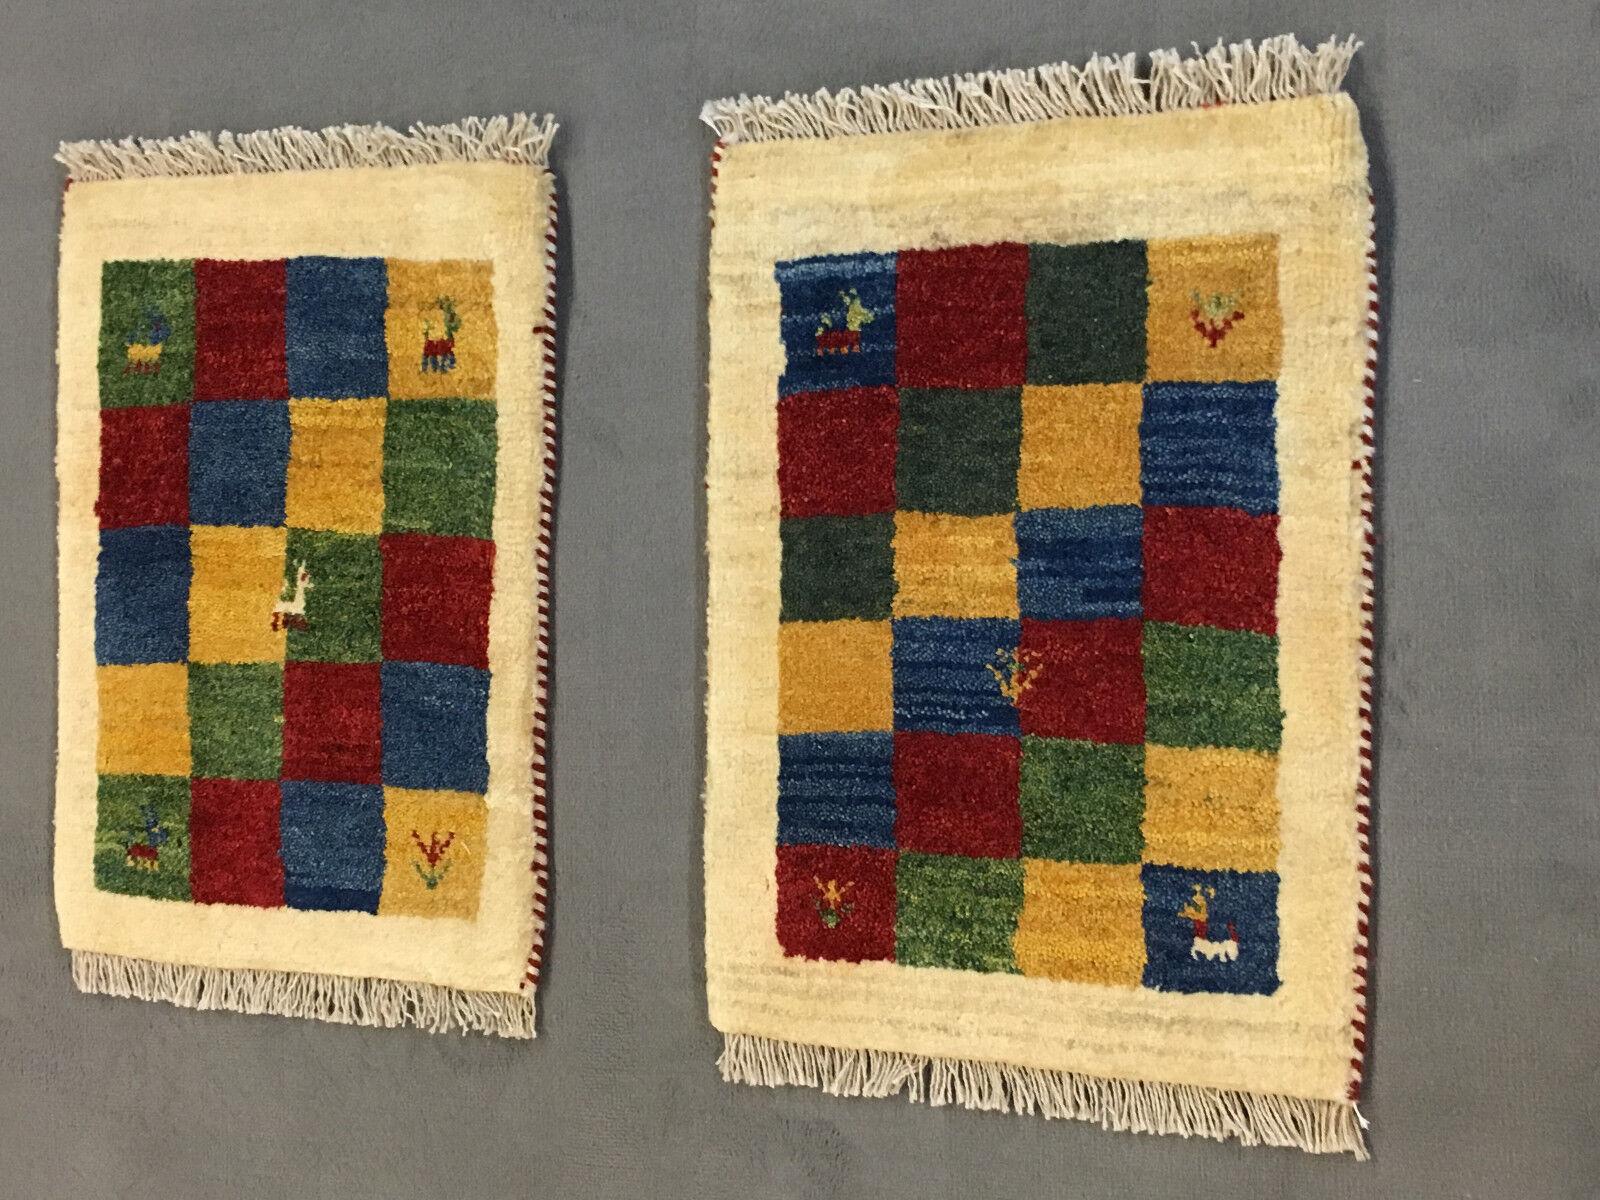 2 x Véritable yalamehbaff Tapis d'Orient persan persan persan TOP (57x40cm) Neuf! | Service Supremacy  635026